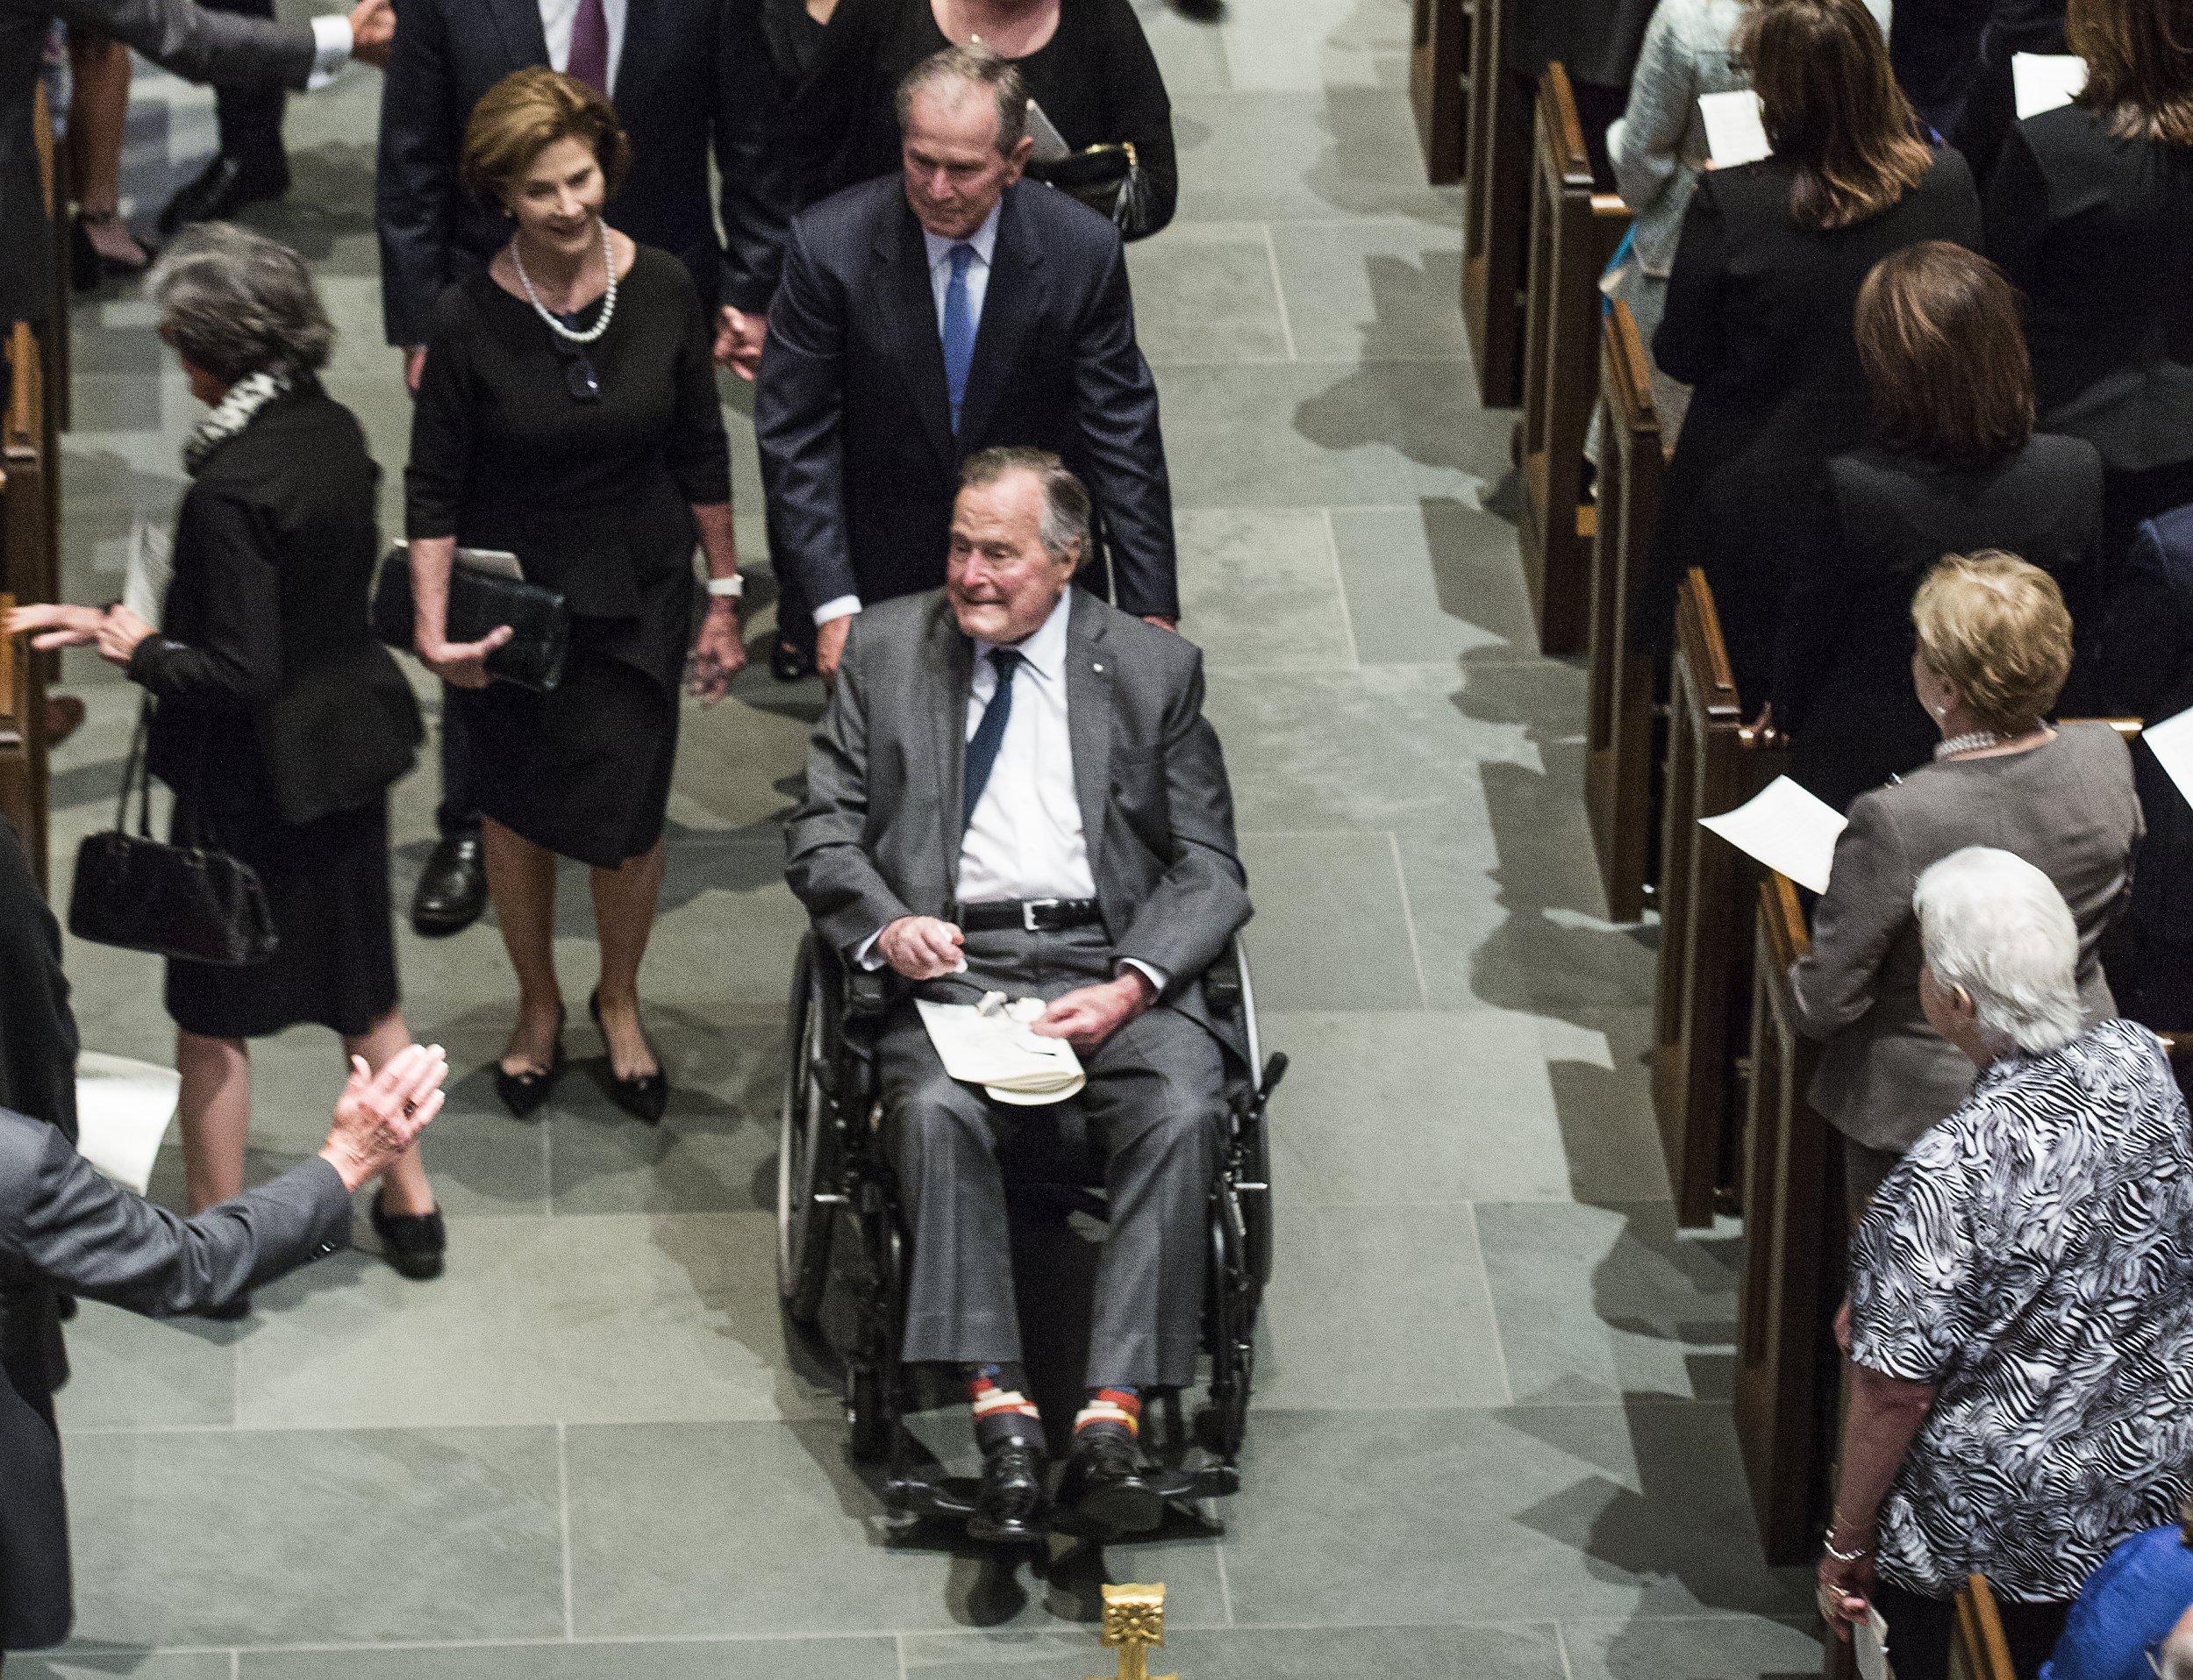 Vascular Parkinsonism, George H.W. Bush Dies Aged 94